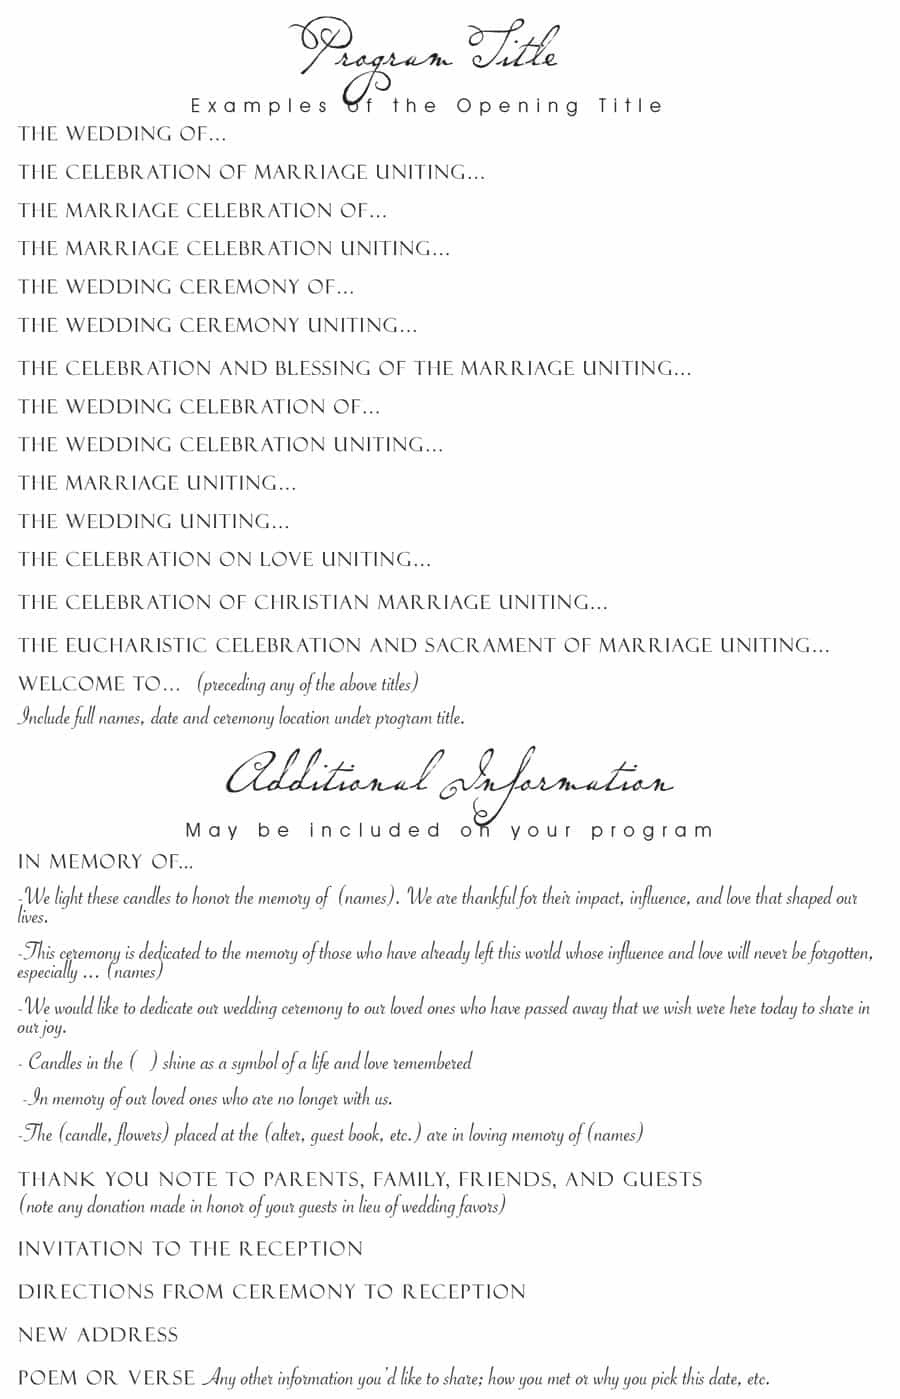 37 Printable Wedding Program Examples & Templates ᐅ Template Lab - Free Printable Wedding Party List